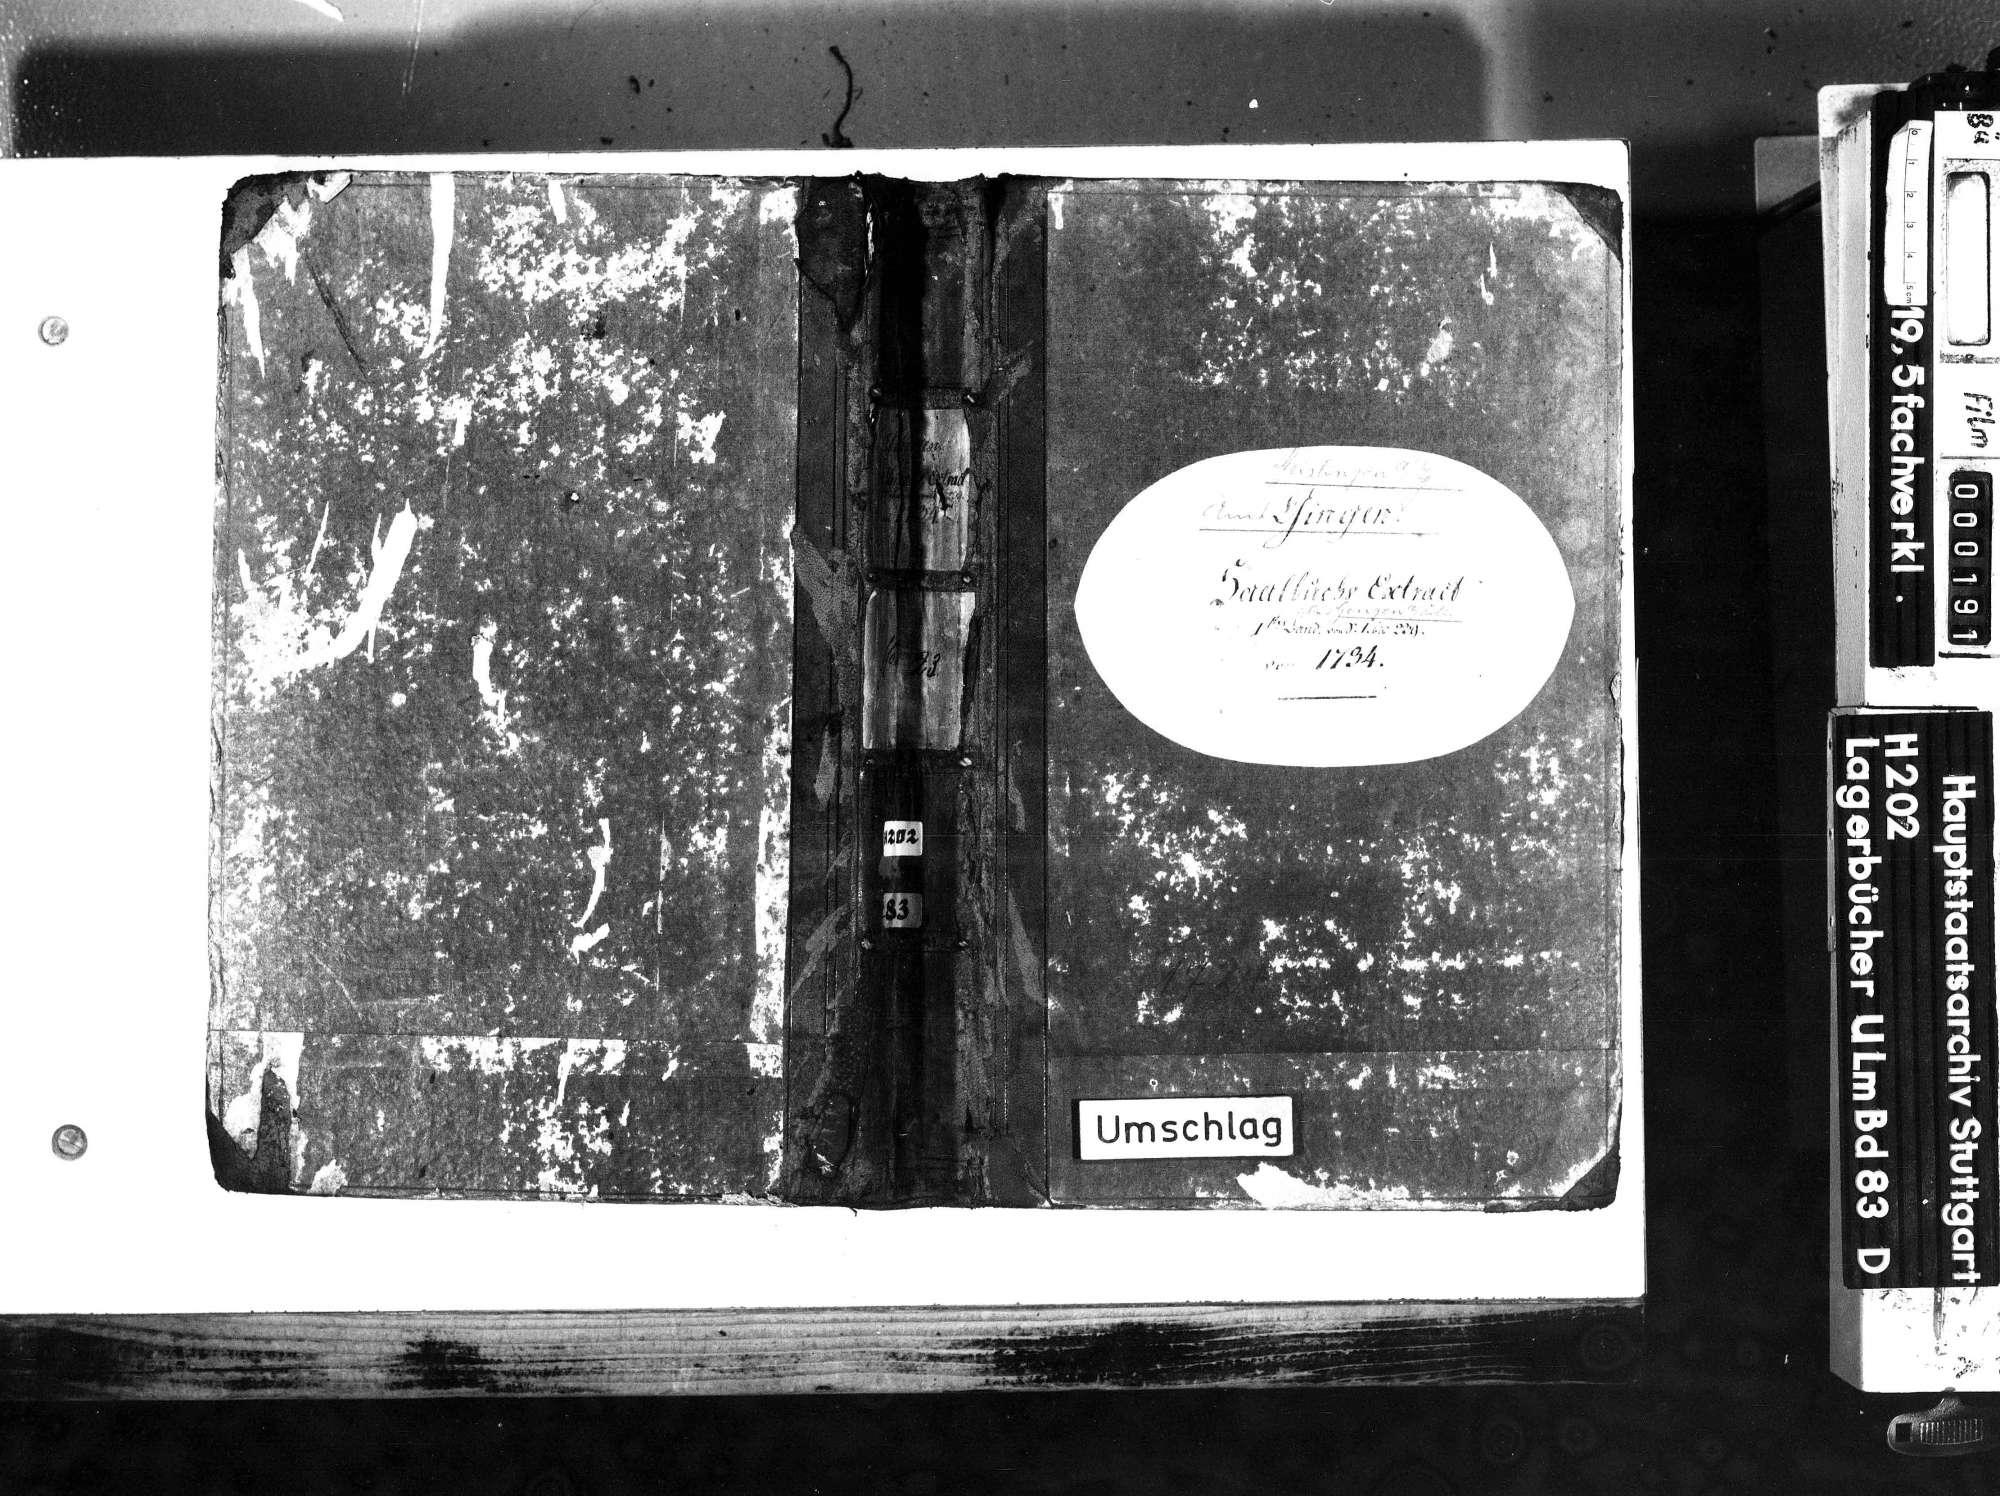 Gingen an der Fils 1. Bd., Bild 1